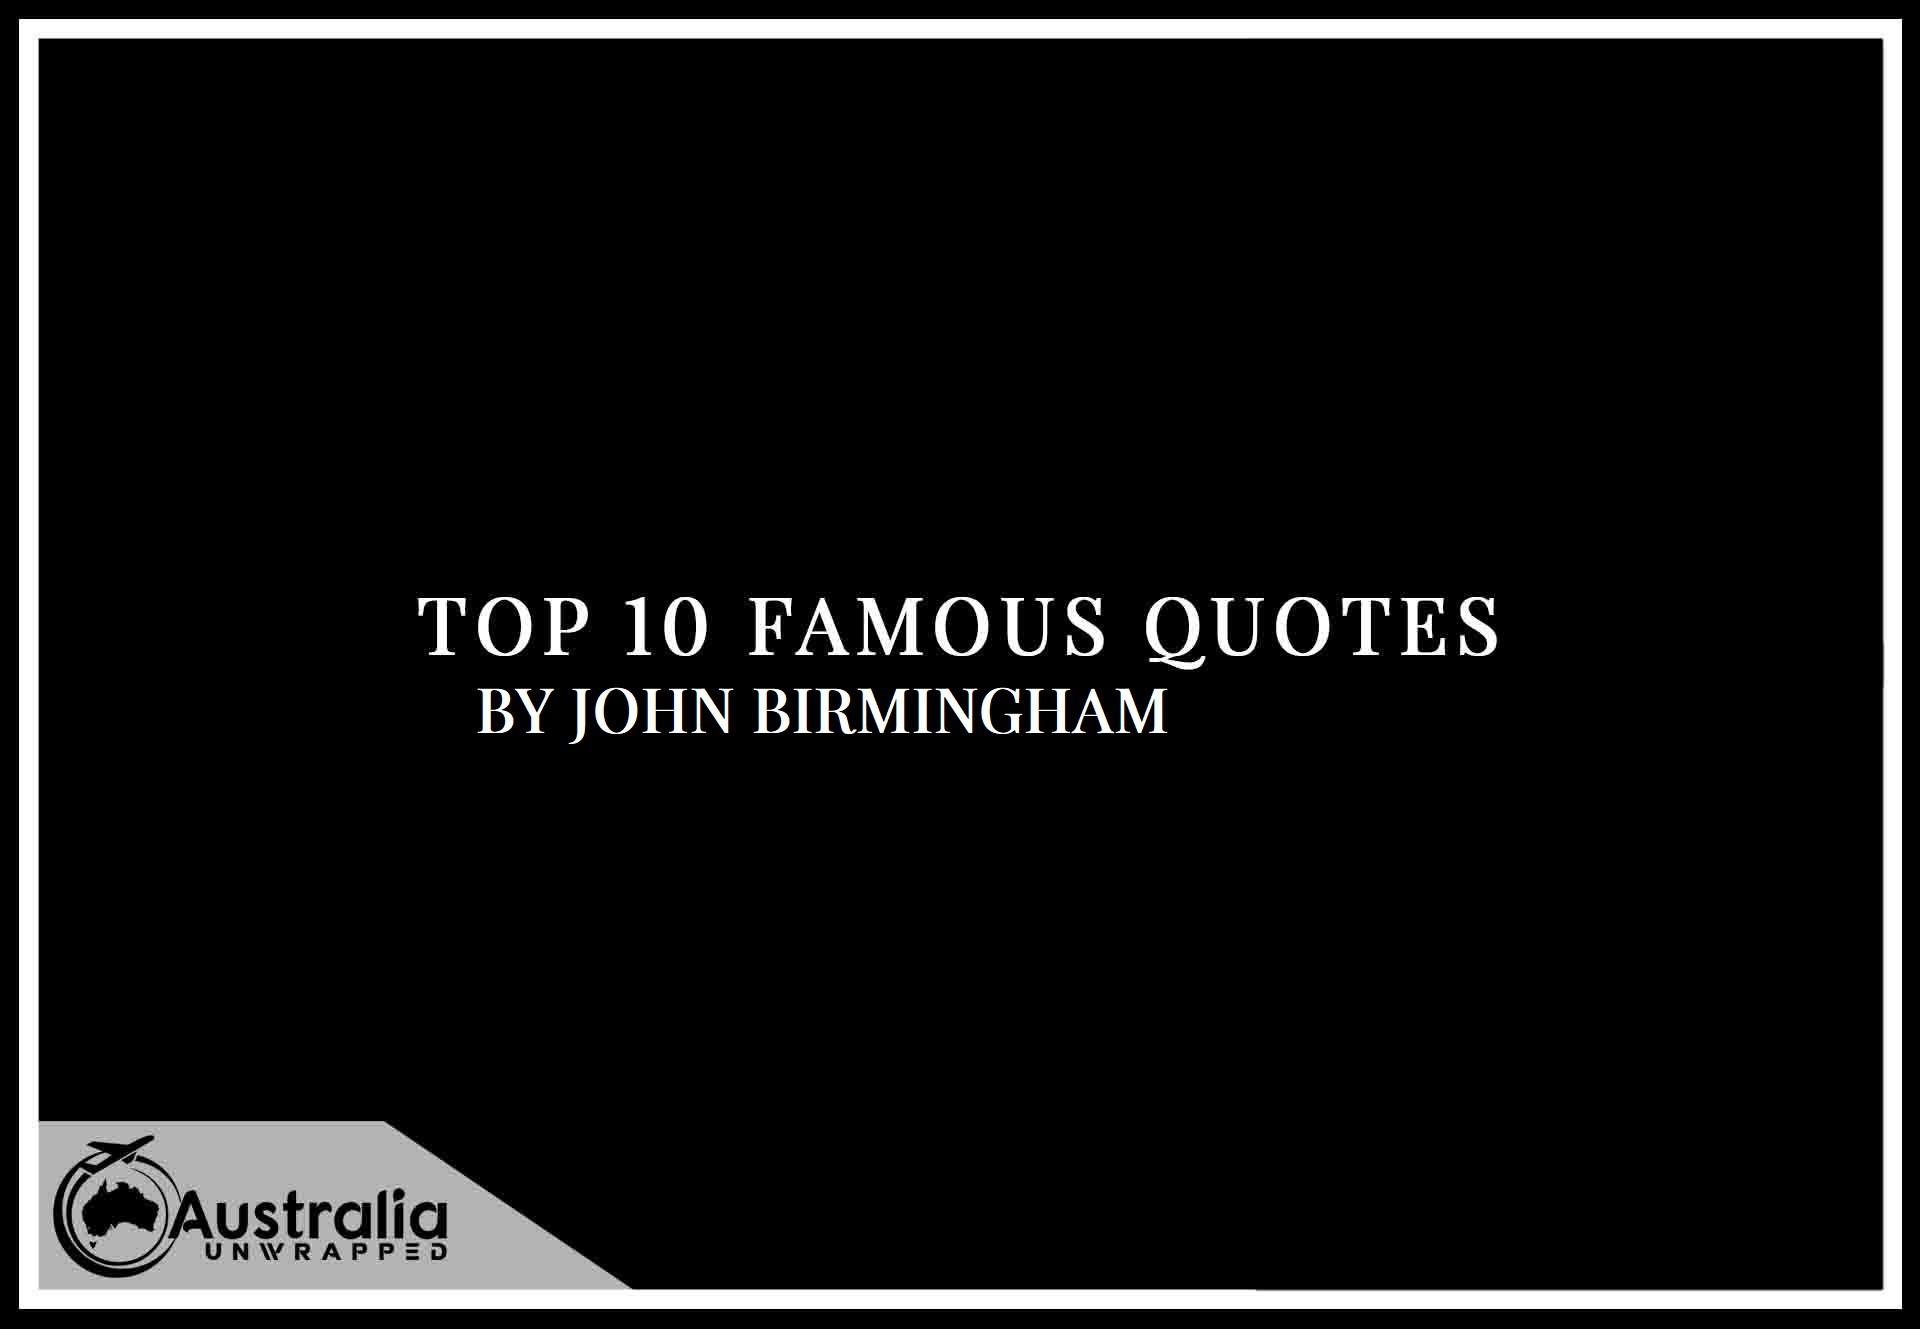 Top 10 Famous Quotes by Author John Birmingham